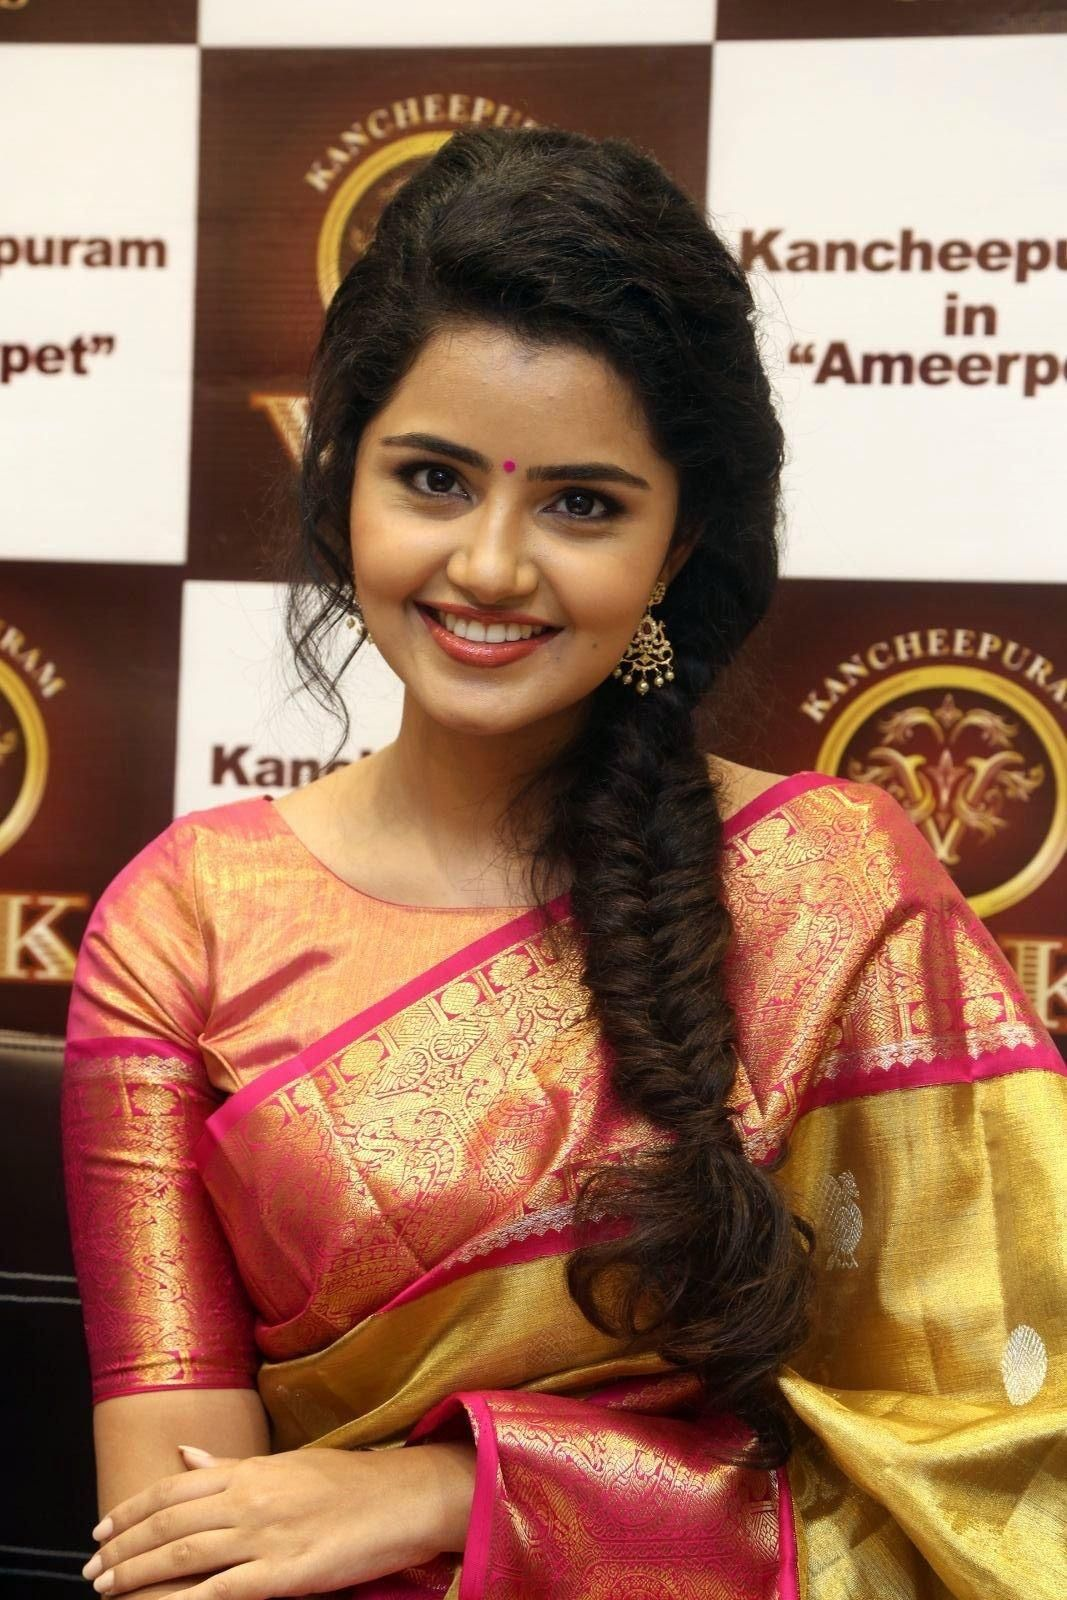 Anupama Parameswaran Simple Hairstyle For Saree Saree Hairstyles South Indian Hairstyle